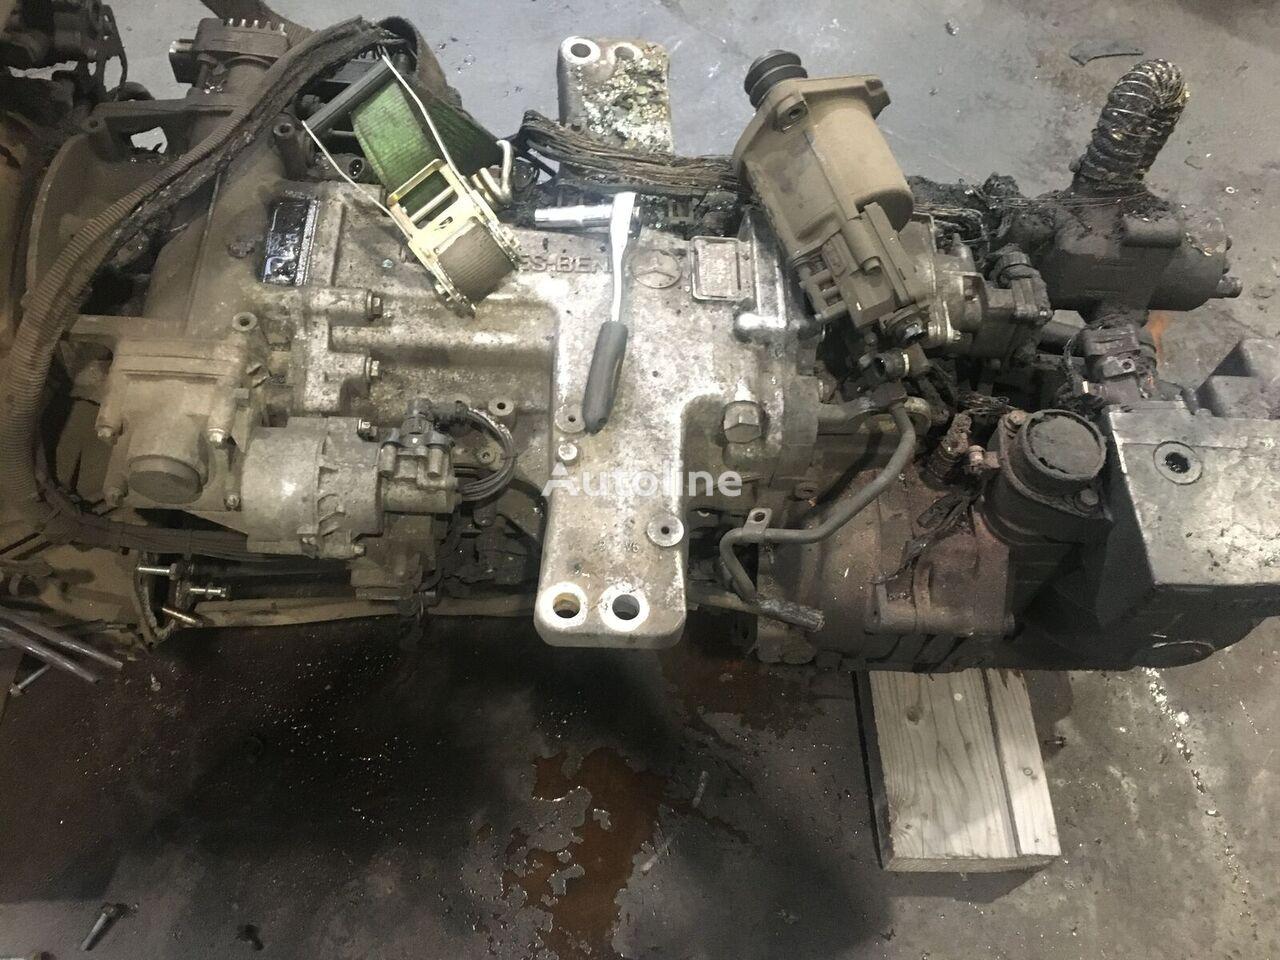 MERCEDES-BENZ G330-12 gearbox for truck